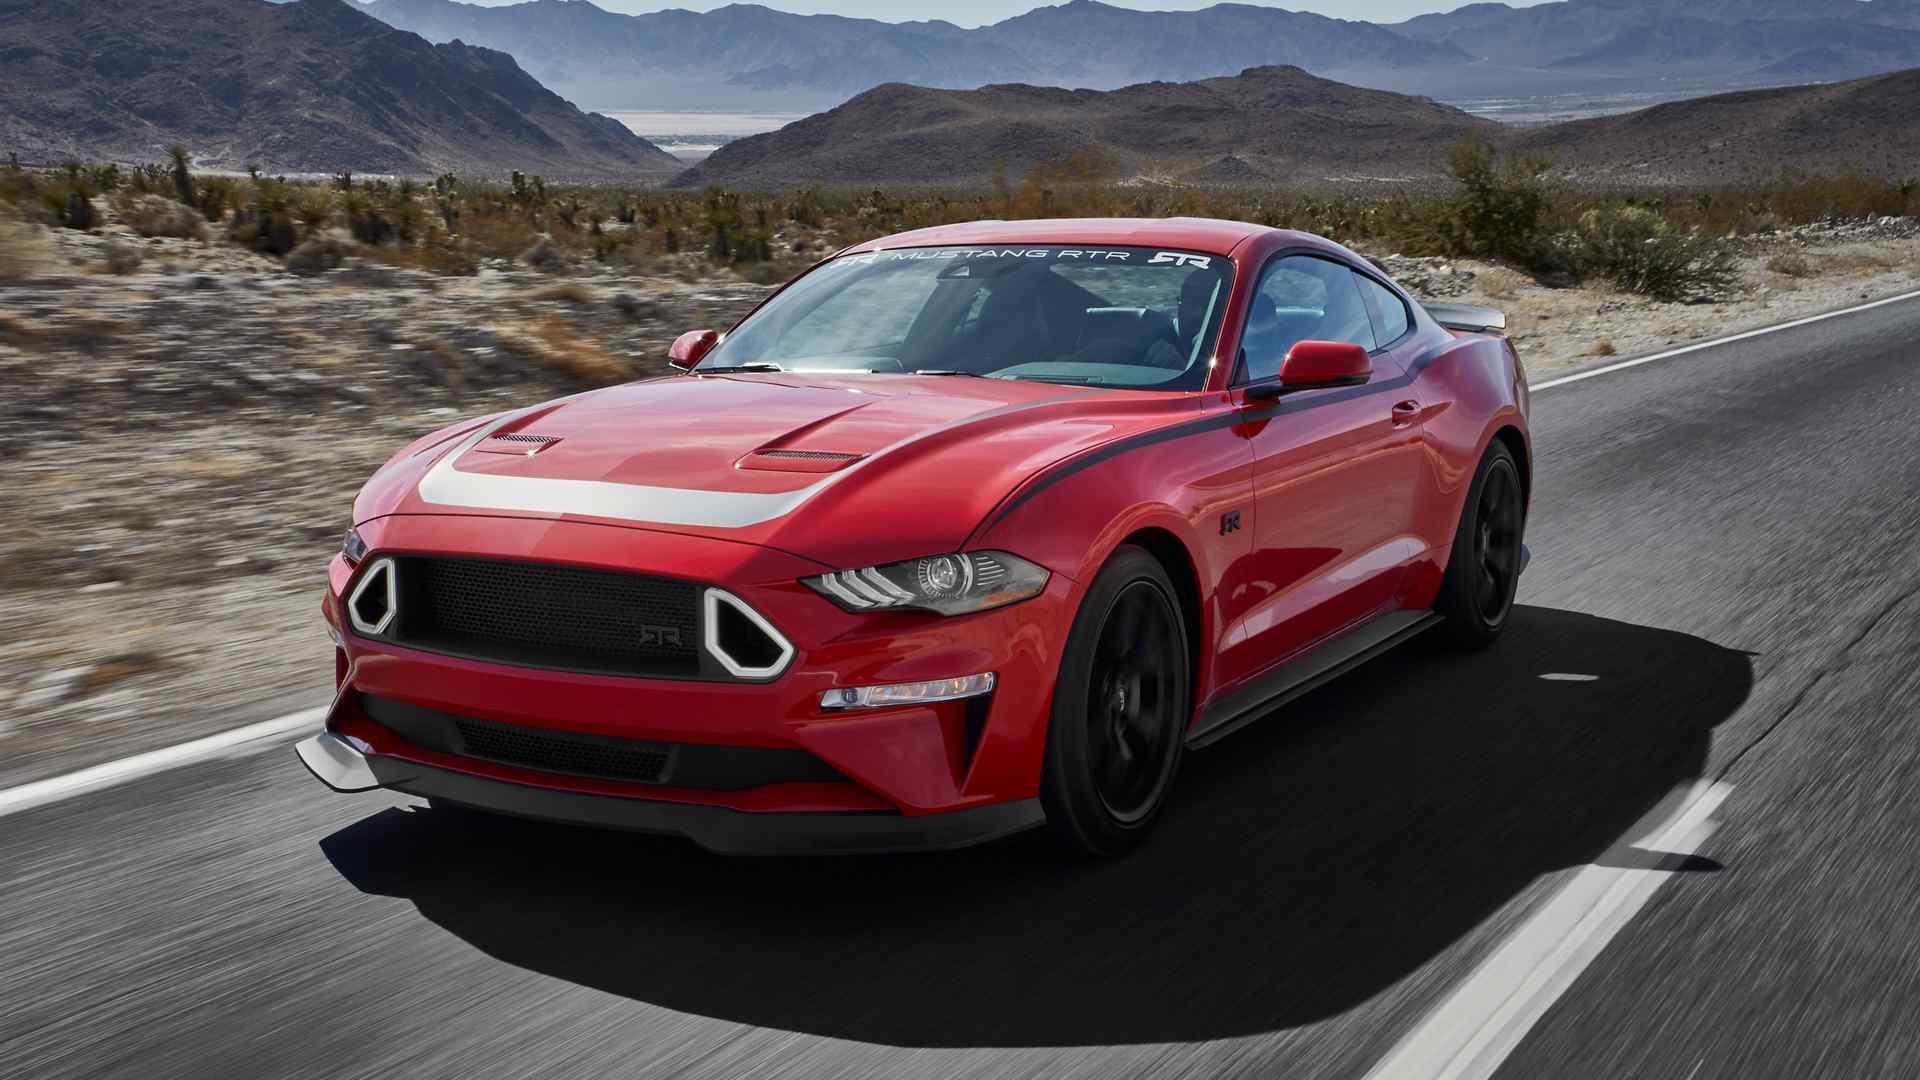 Ford предложил владельцам серийный тюнинг-пакет Series 1 Mustang RTR